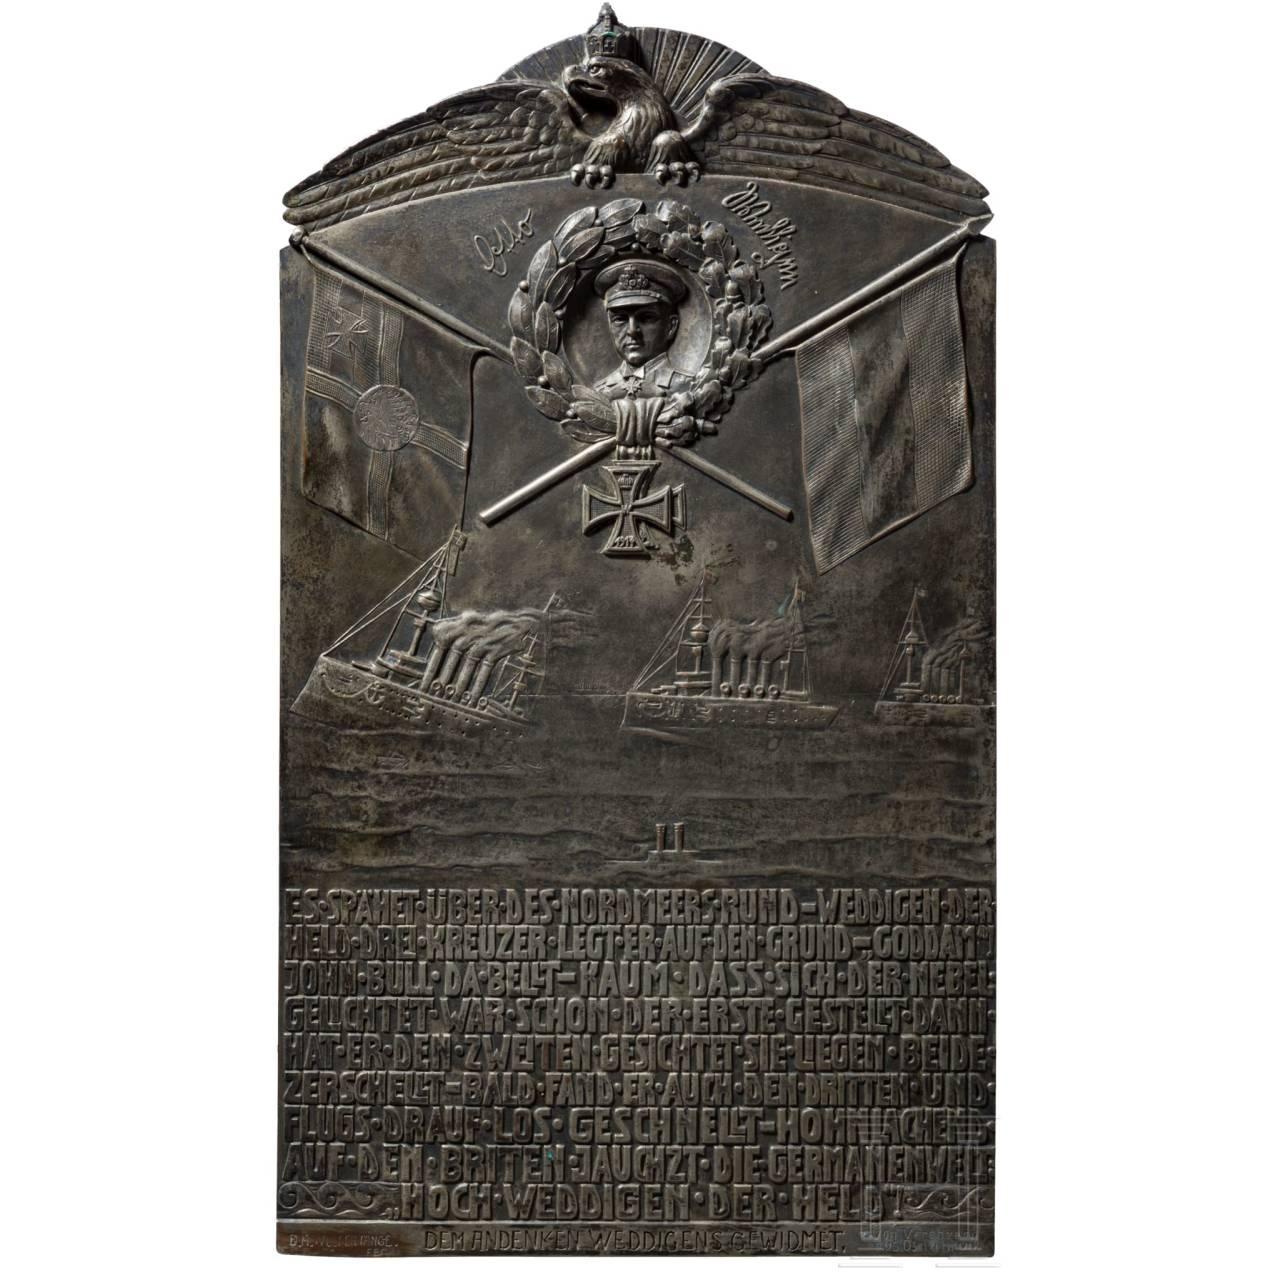 A commemorative plaque to the submarine commander Otto Weddigen